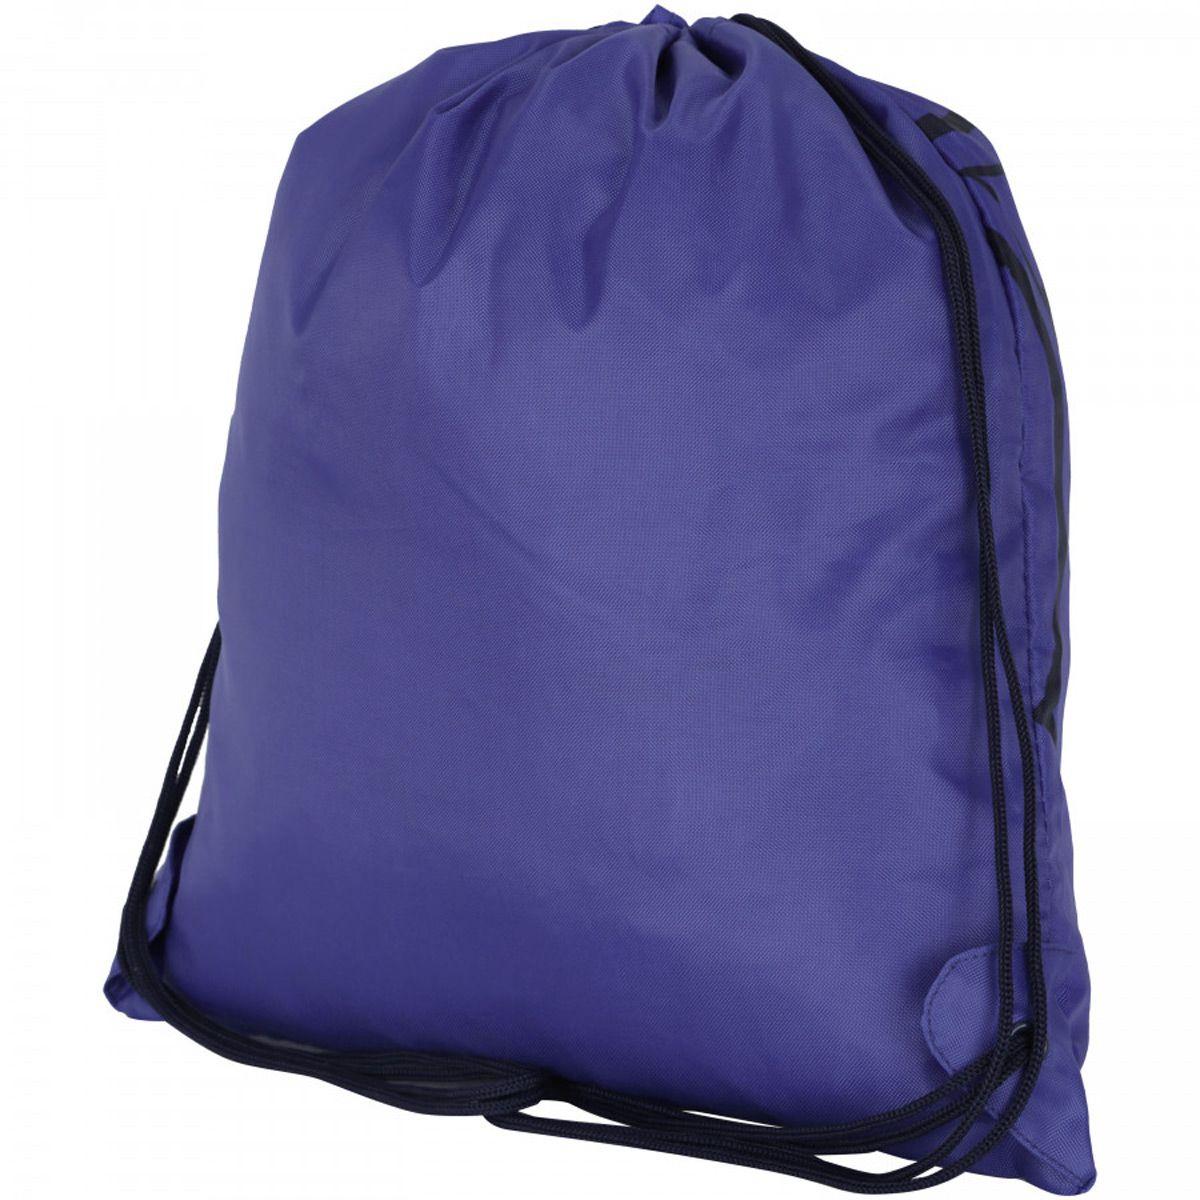 Gym Bag Saco do Barcelona 8318